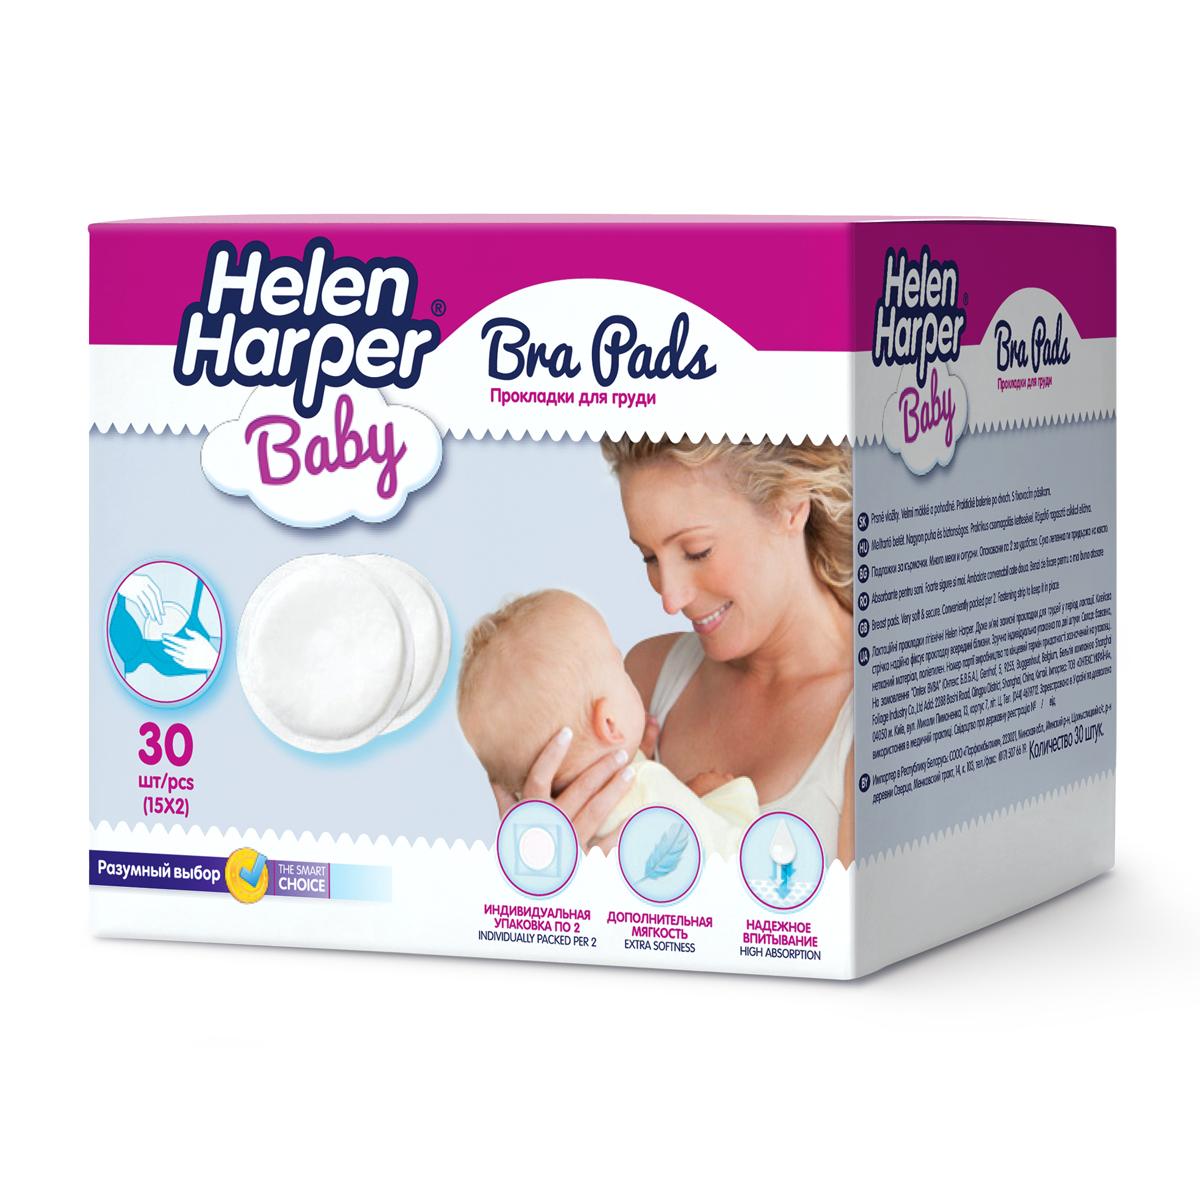 ��������� ��� ����� Helen Harper ����������� 30 ��